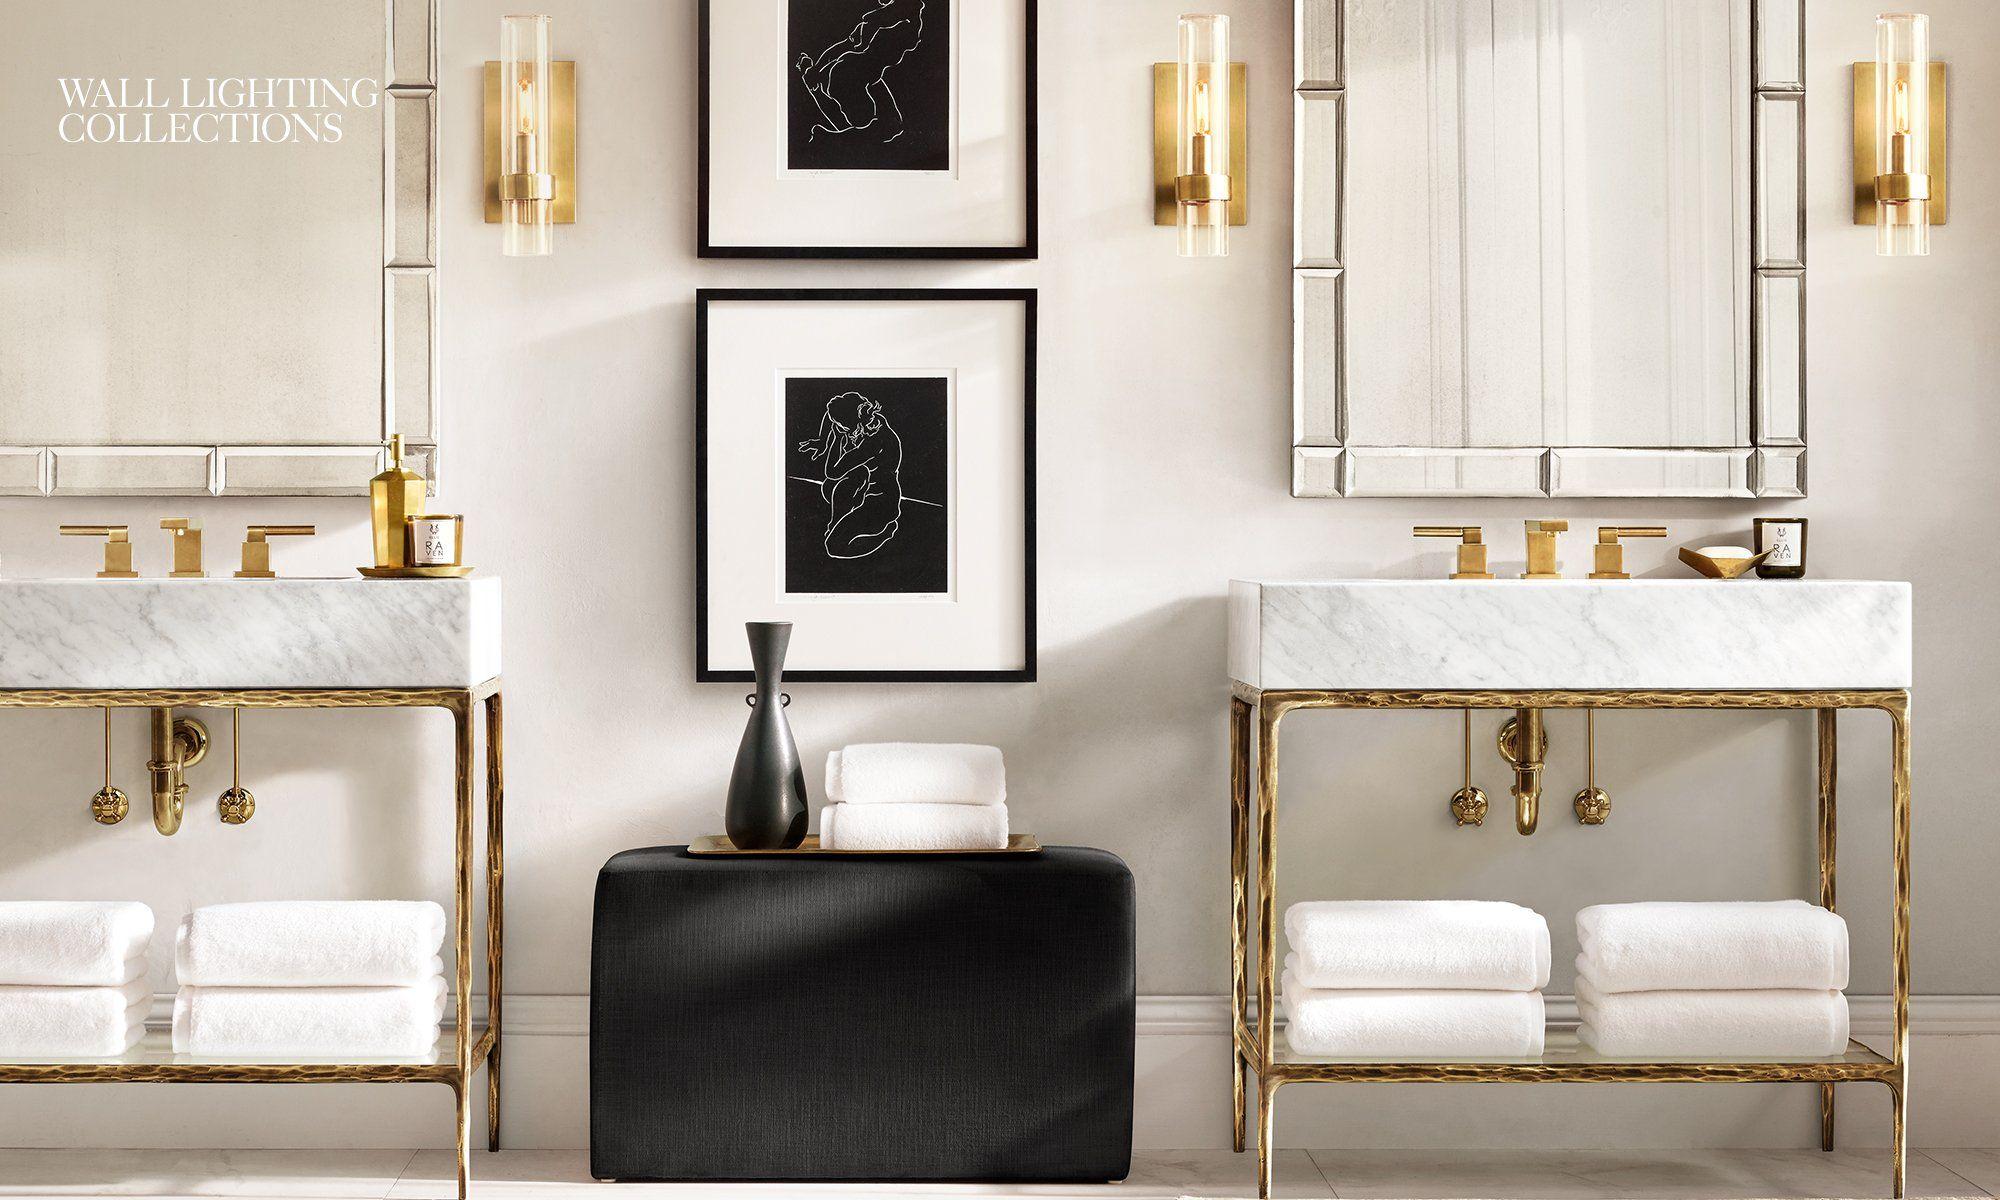 Rh Homepage In 2020 Sconces Light Fixtures Bathroom Vanity